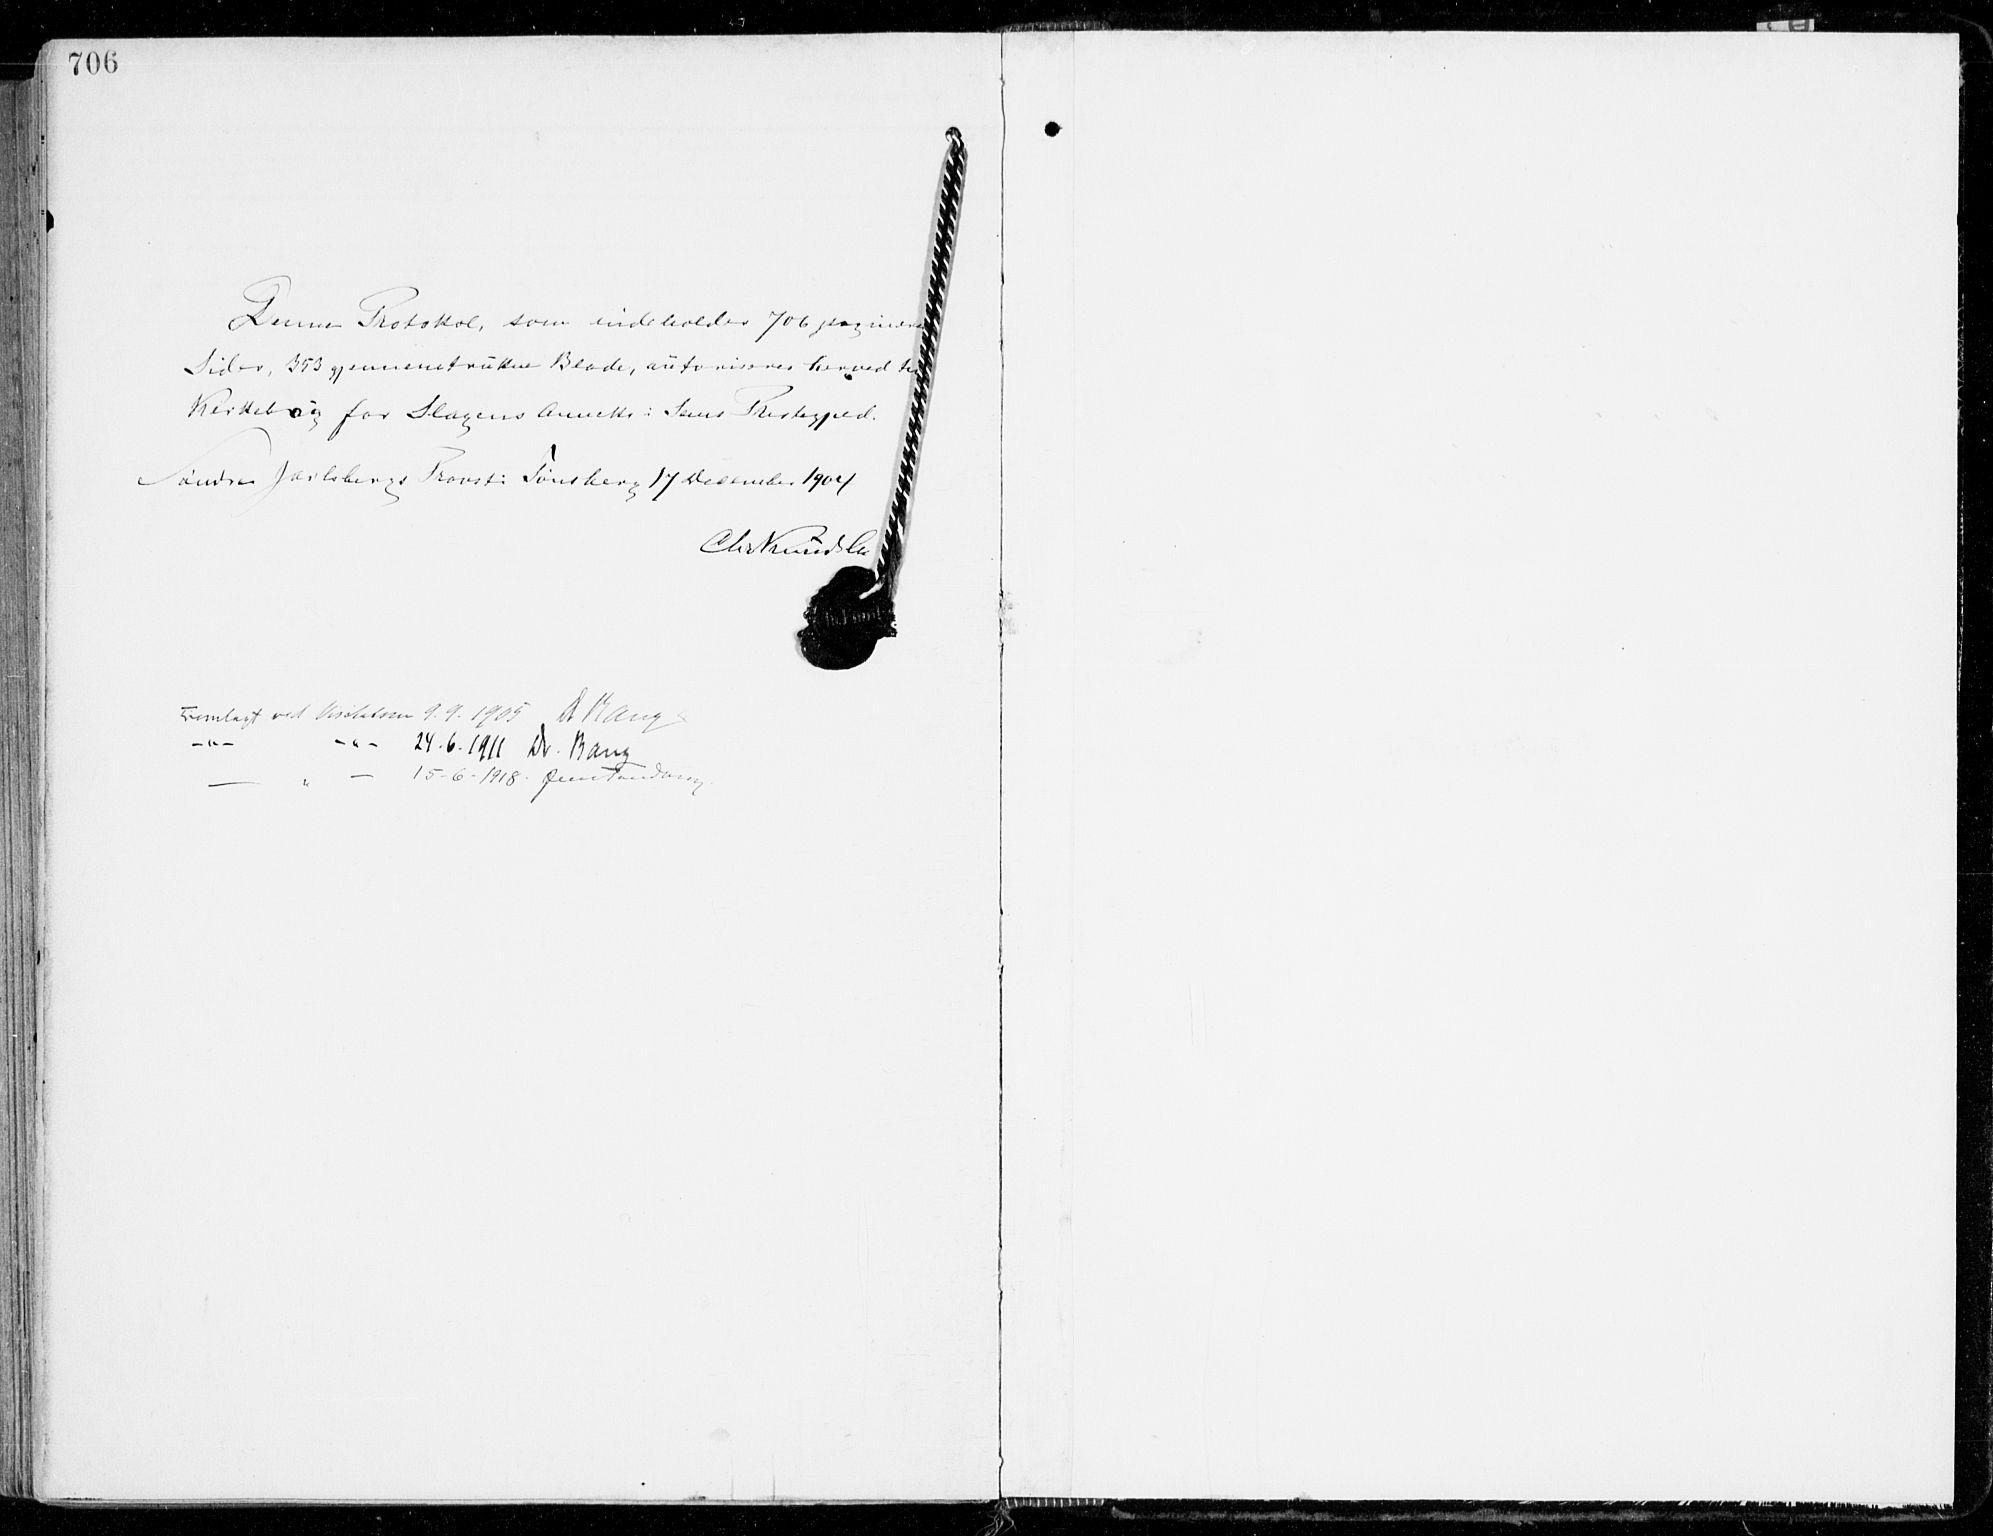 SAKO, Sem kirkebøker, F/Fb/L0006: Ministerialbok nr. II 6, 1905-1918, s. 706-707